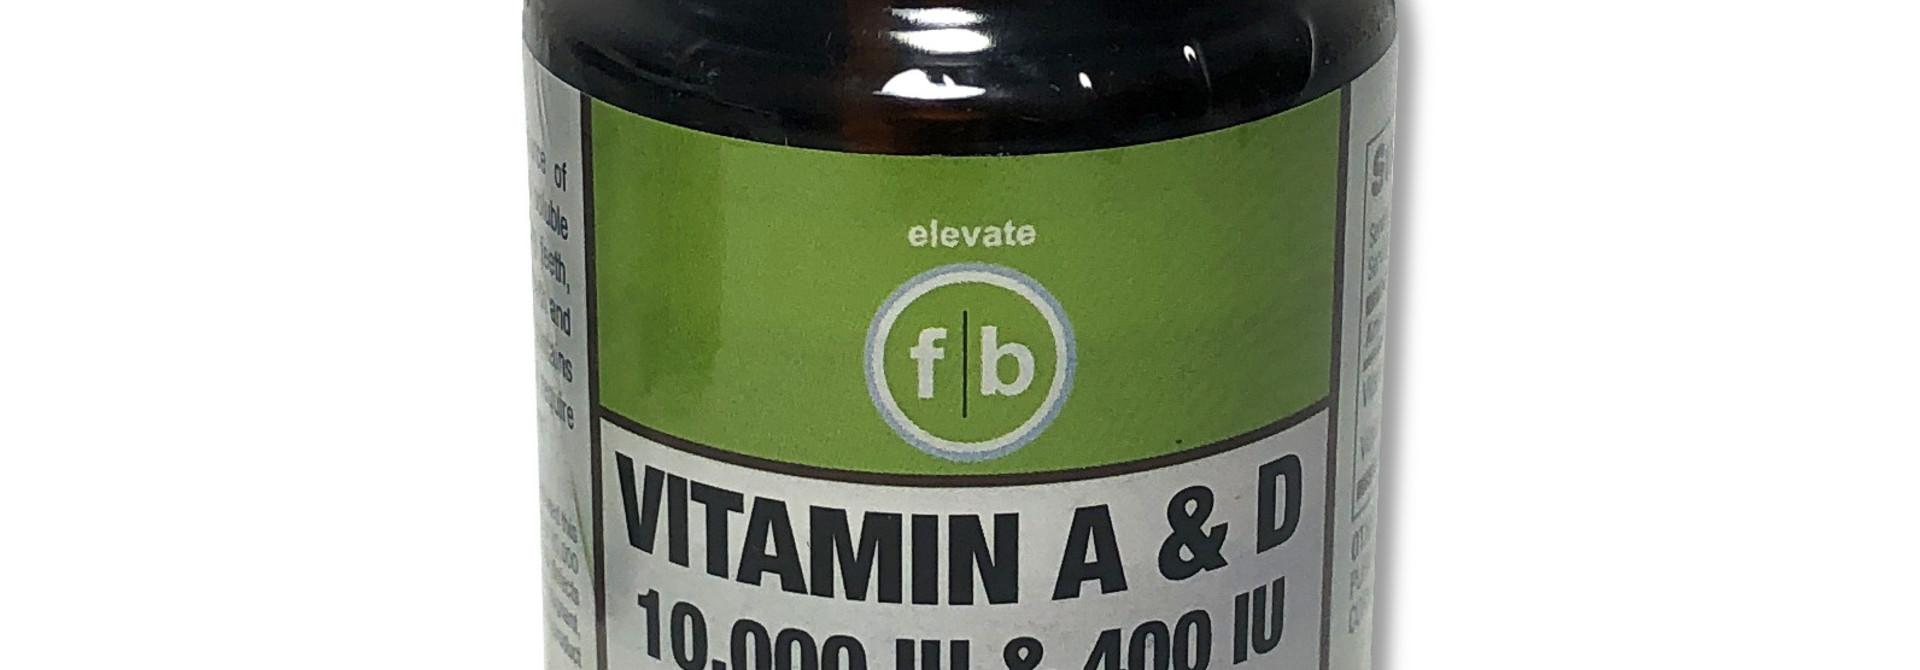 Vitamin A & D 10,000 & 400 IU